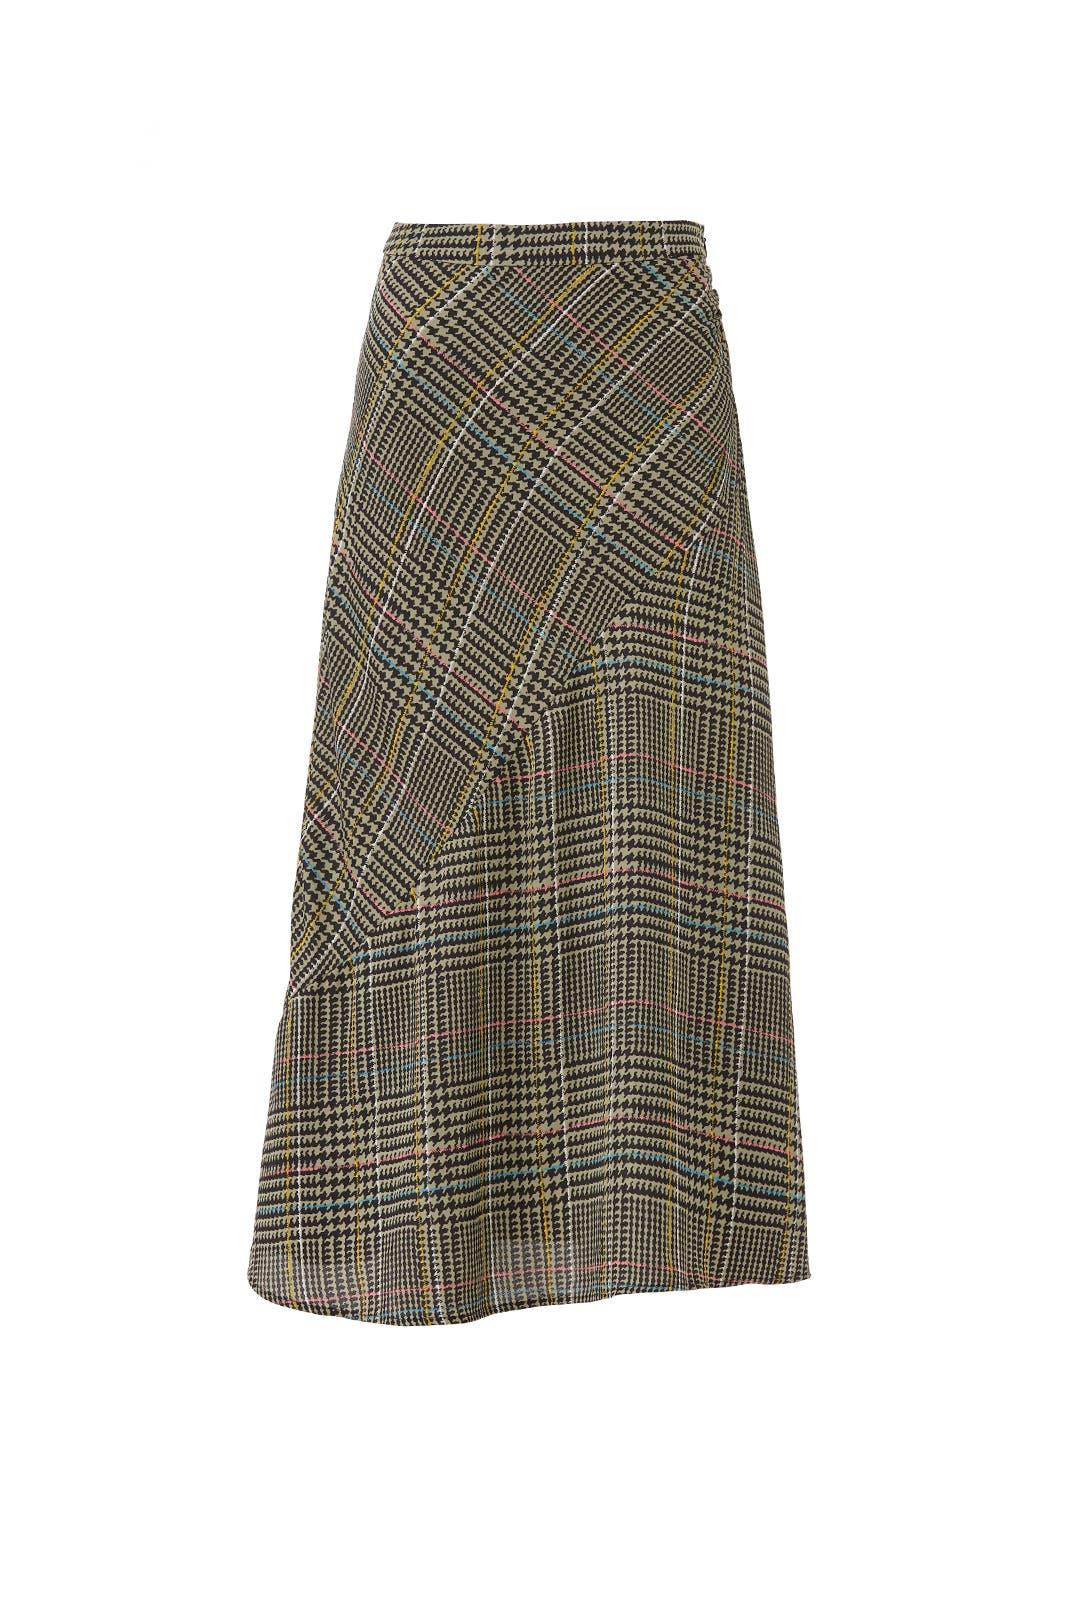 9a5de5abb Plaid Marsha Midi Skirt by ASTR for $30 | Rent the Runway